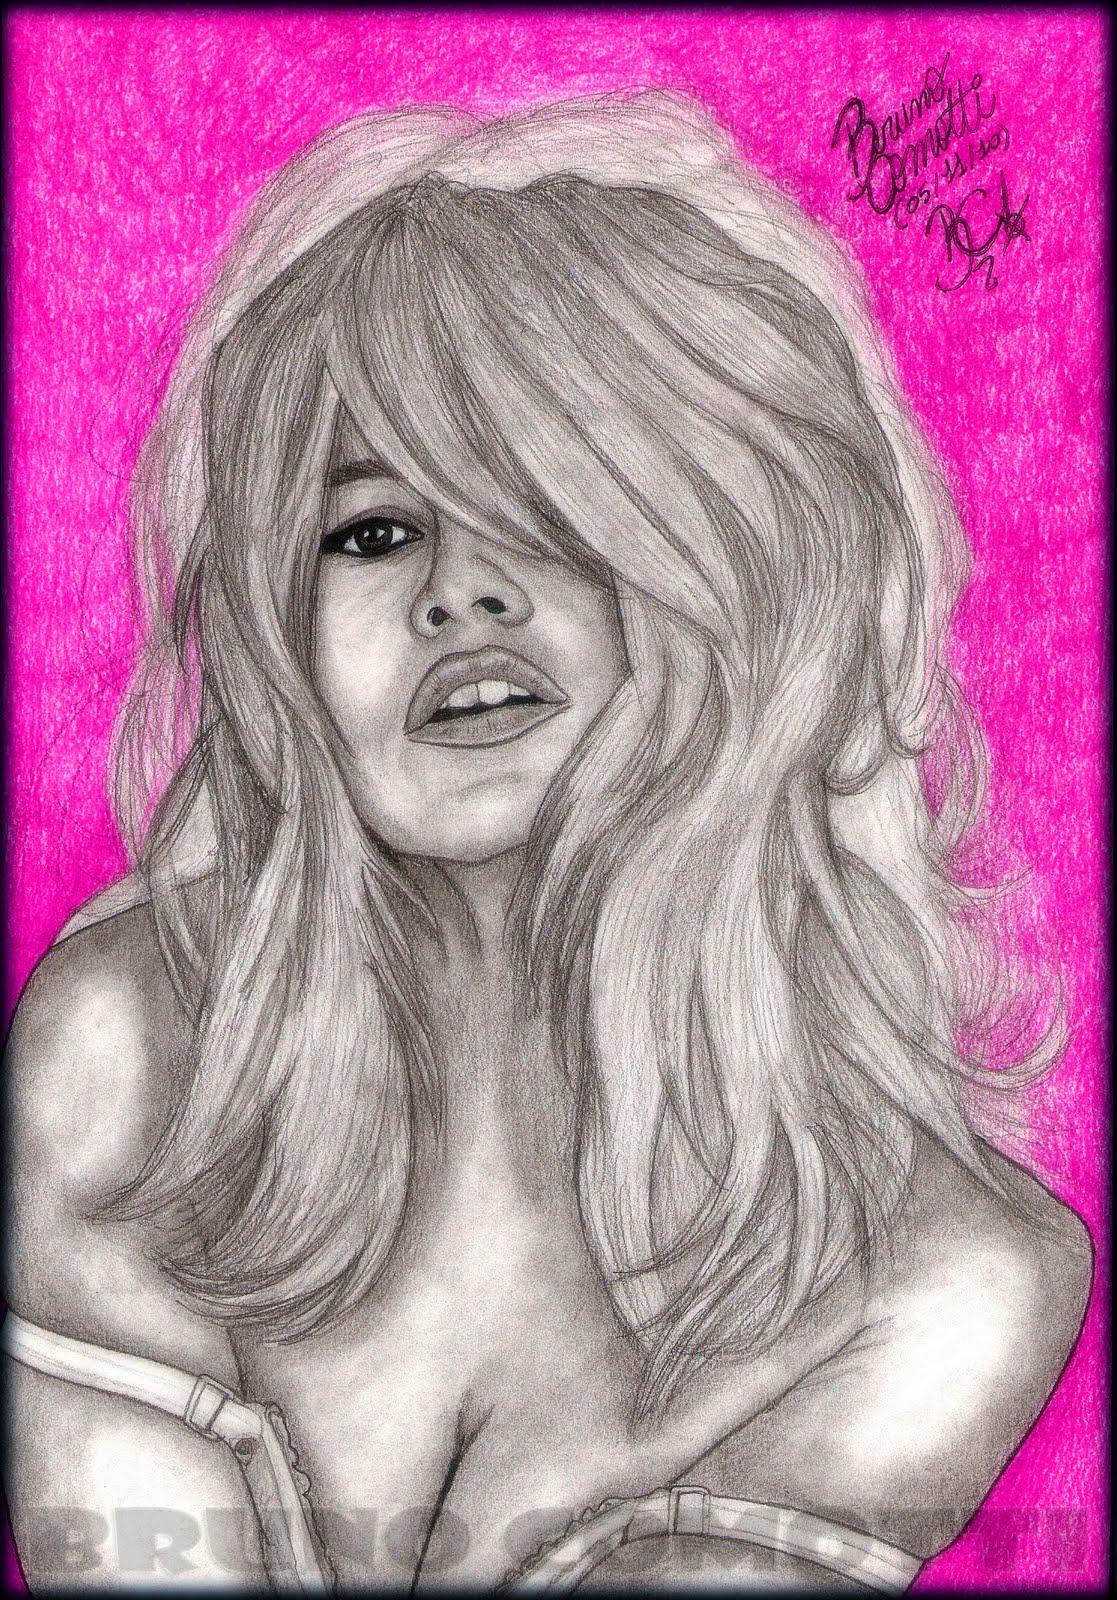 http://2.bp.blogspot.com/_APihxFS4JR0/TNTP1ftKOHI/AAAAAAAACuw/SHD8YIGG0W8/s1600/Brigitte+Bardot+By+Bruno+Comotti+03.jpg